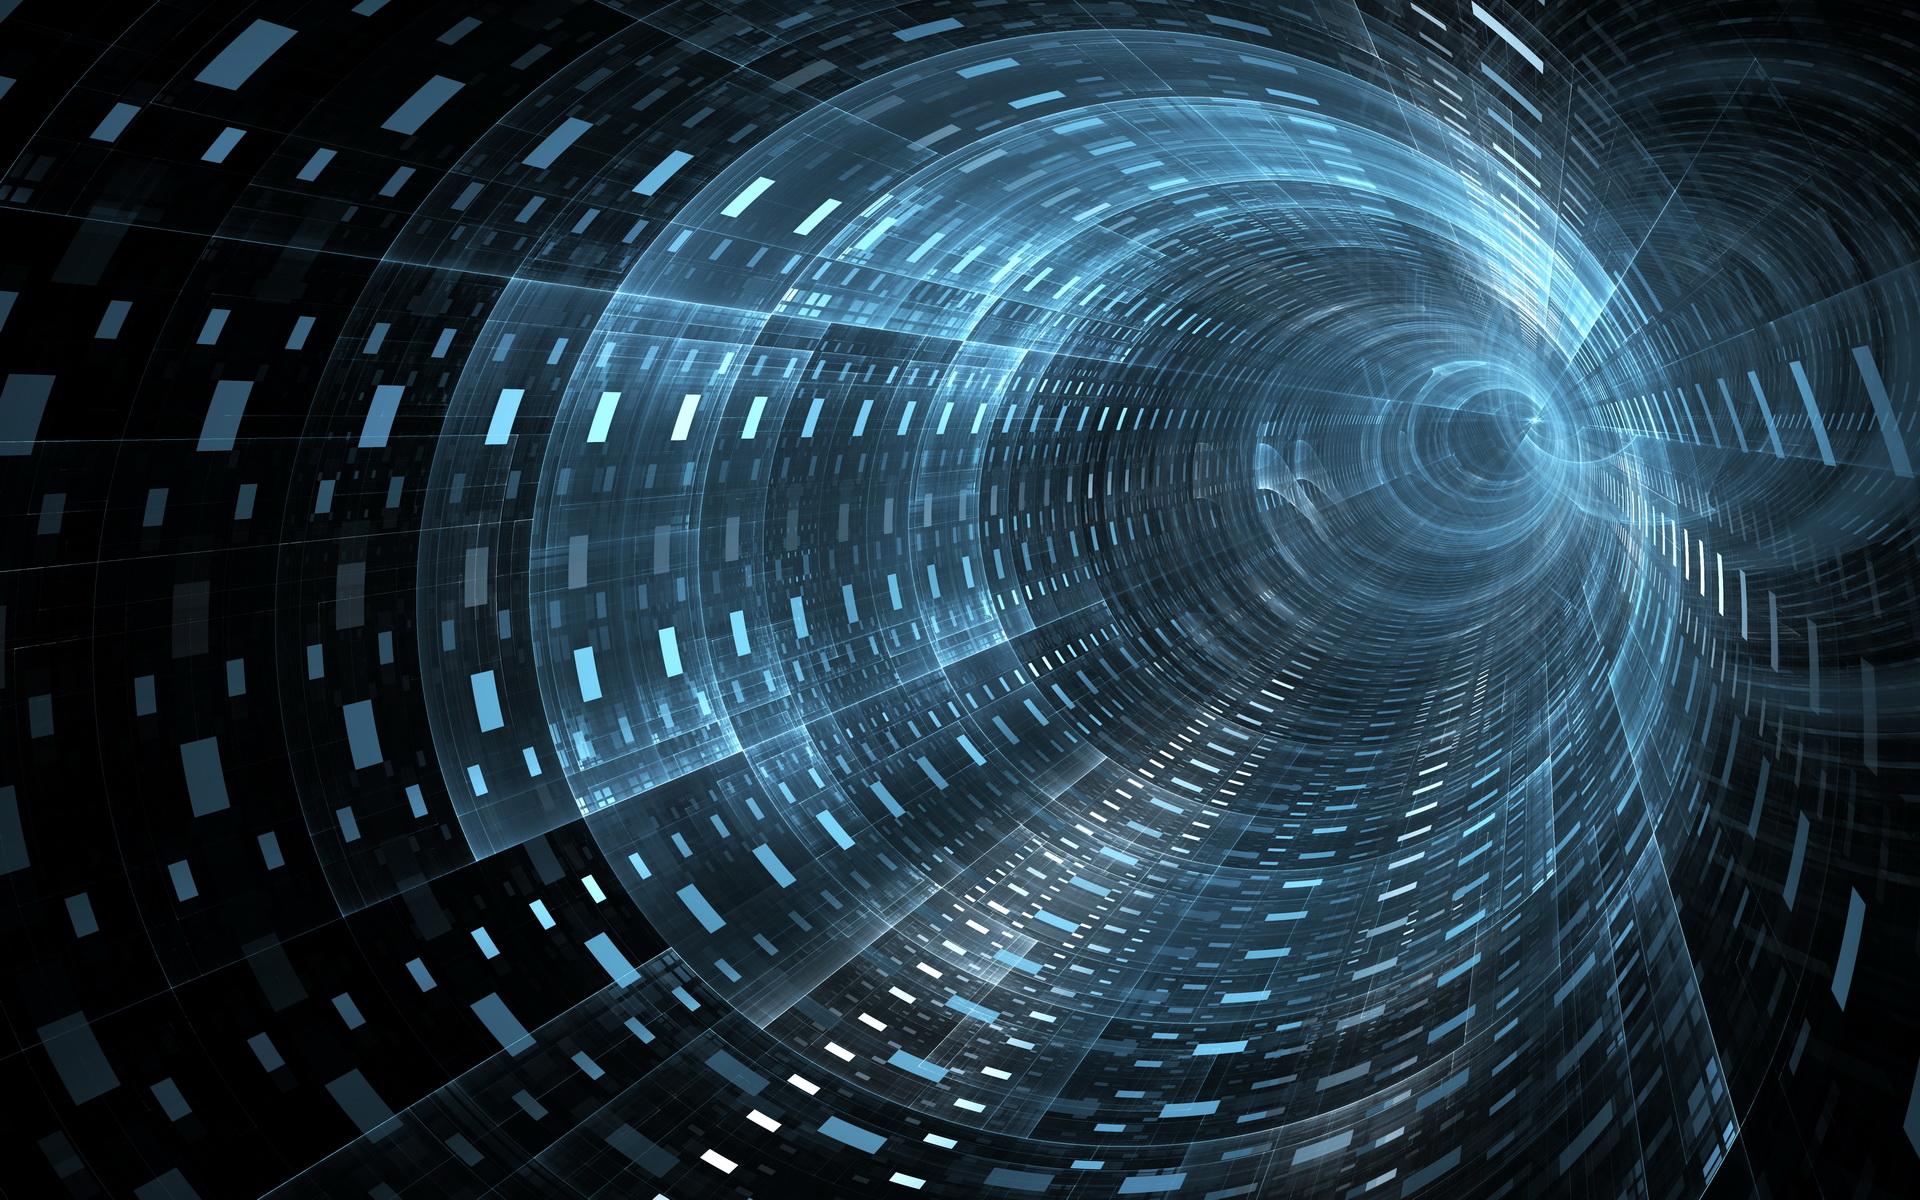 New 3d Telepresence Technology Puts Cu Experts Eye To Eye